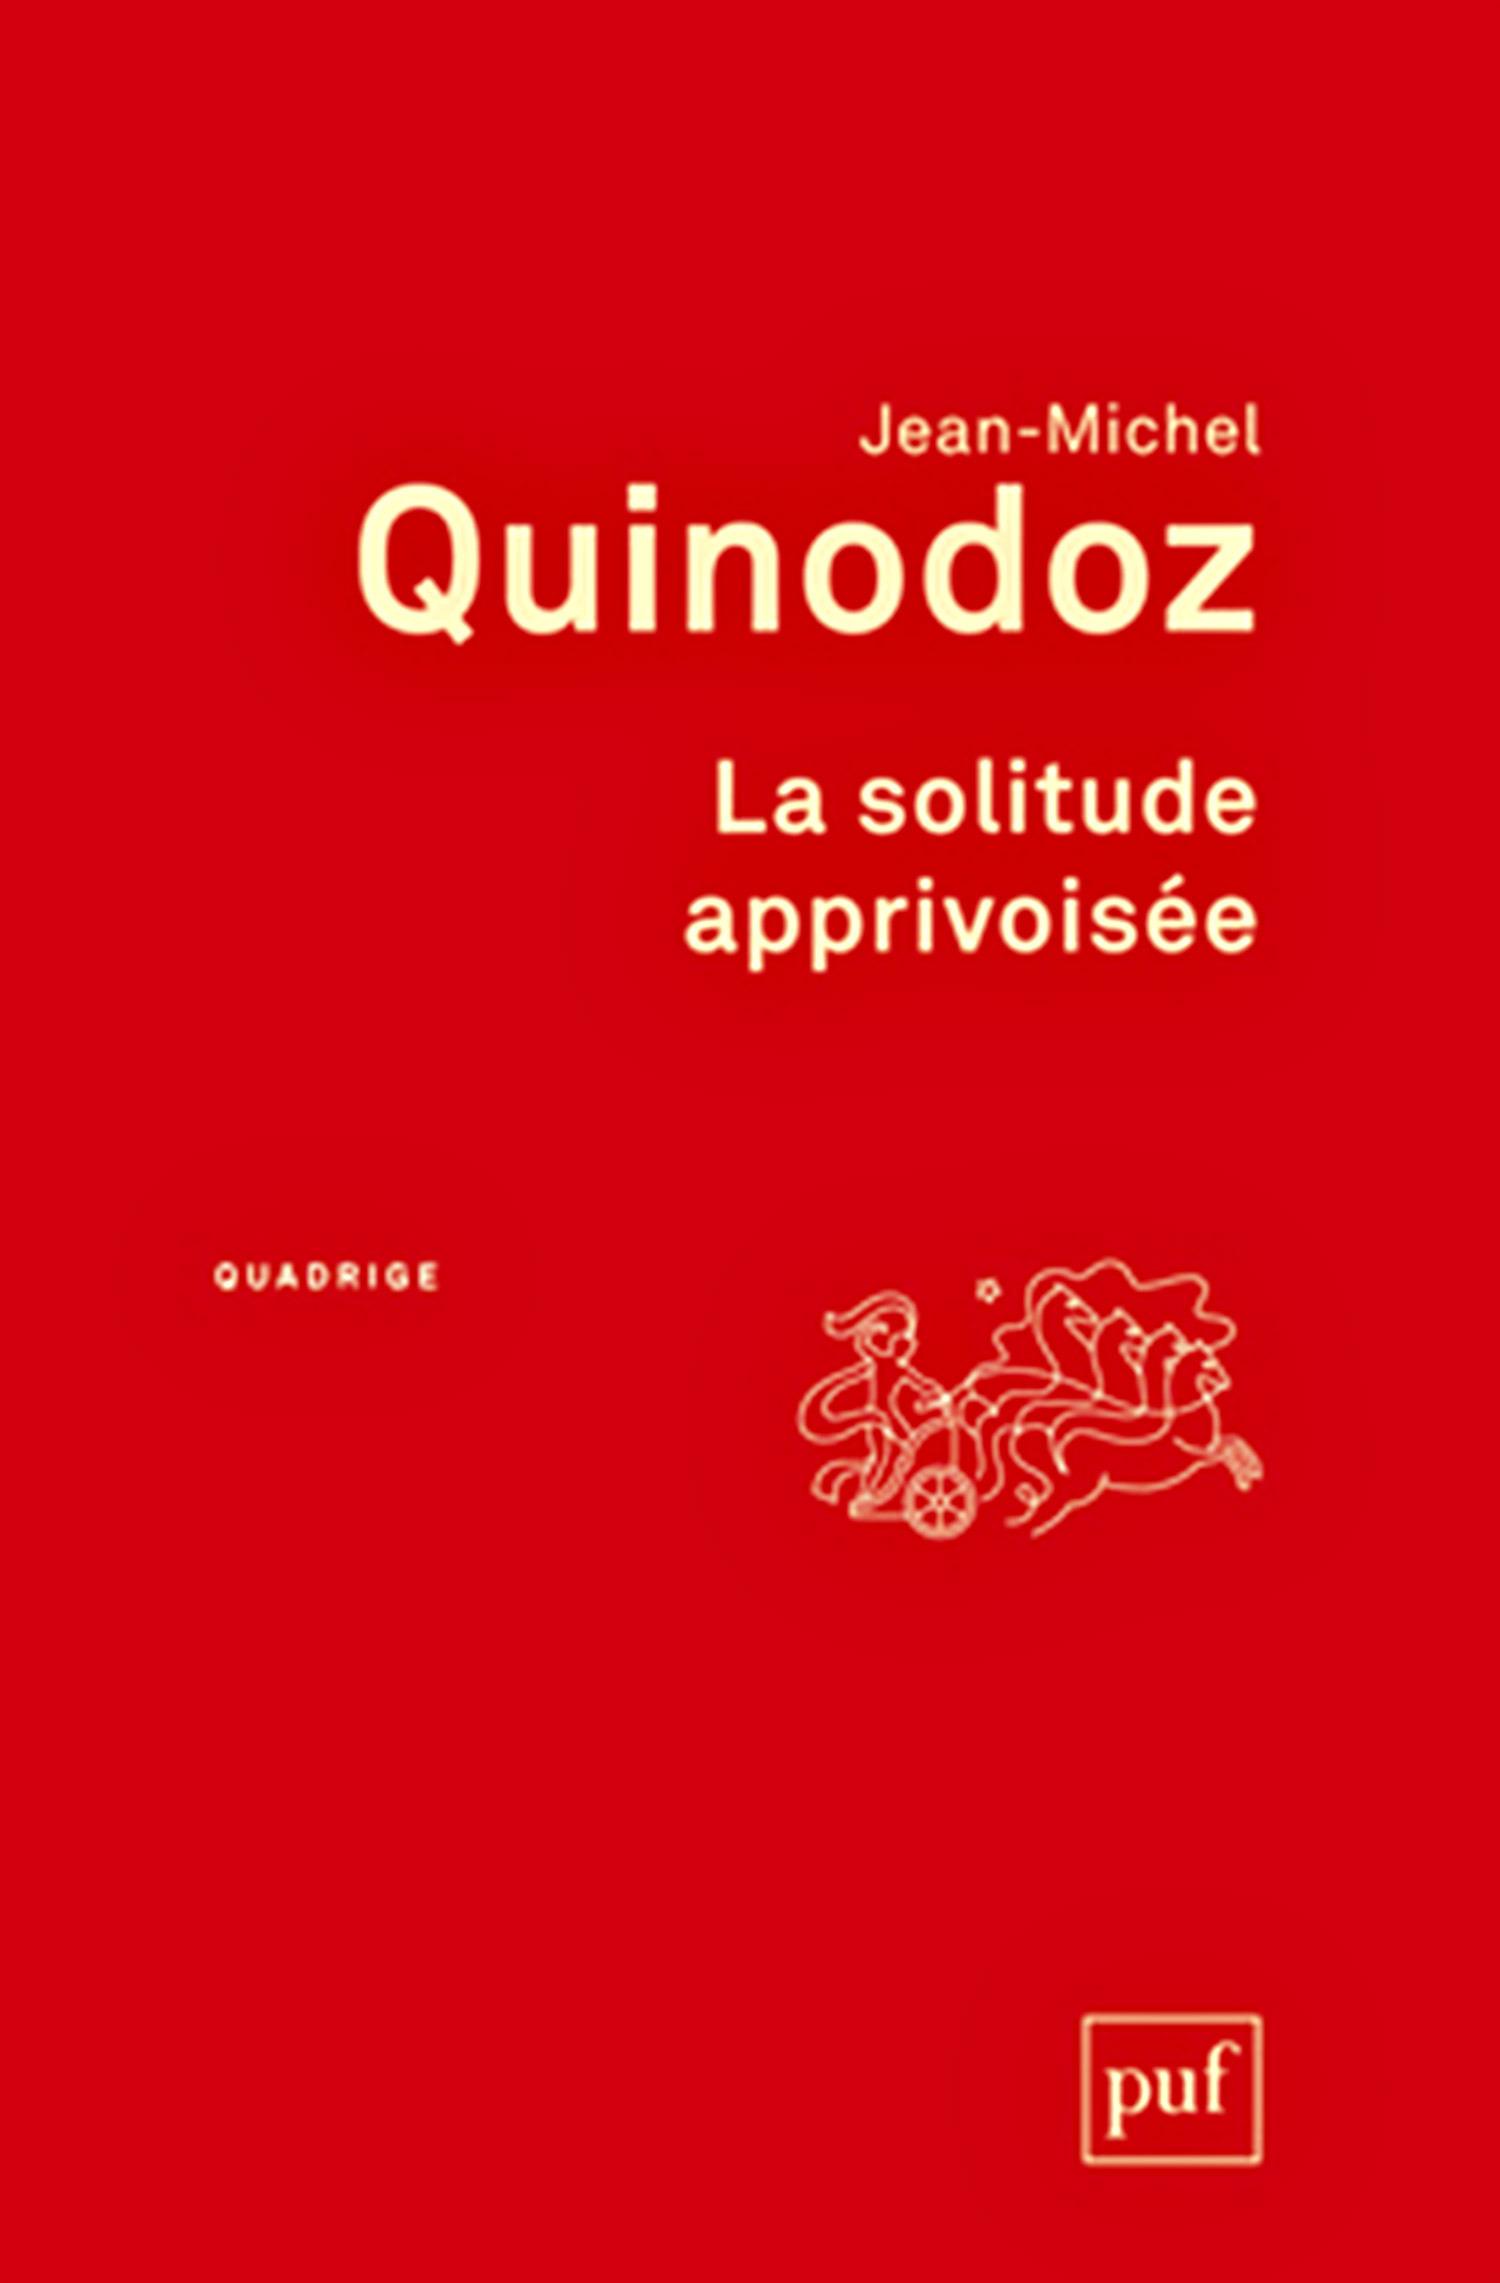 Jean-Michel Quinodoz La solitude apprivoisée